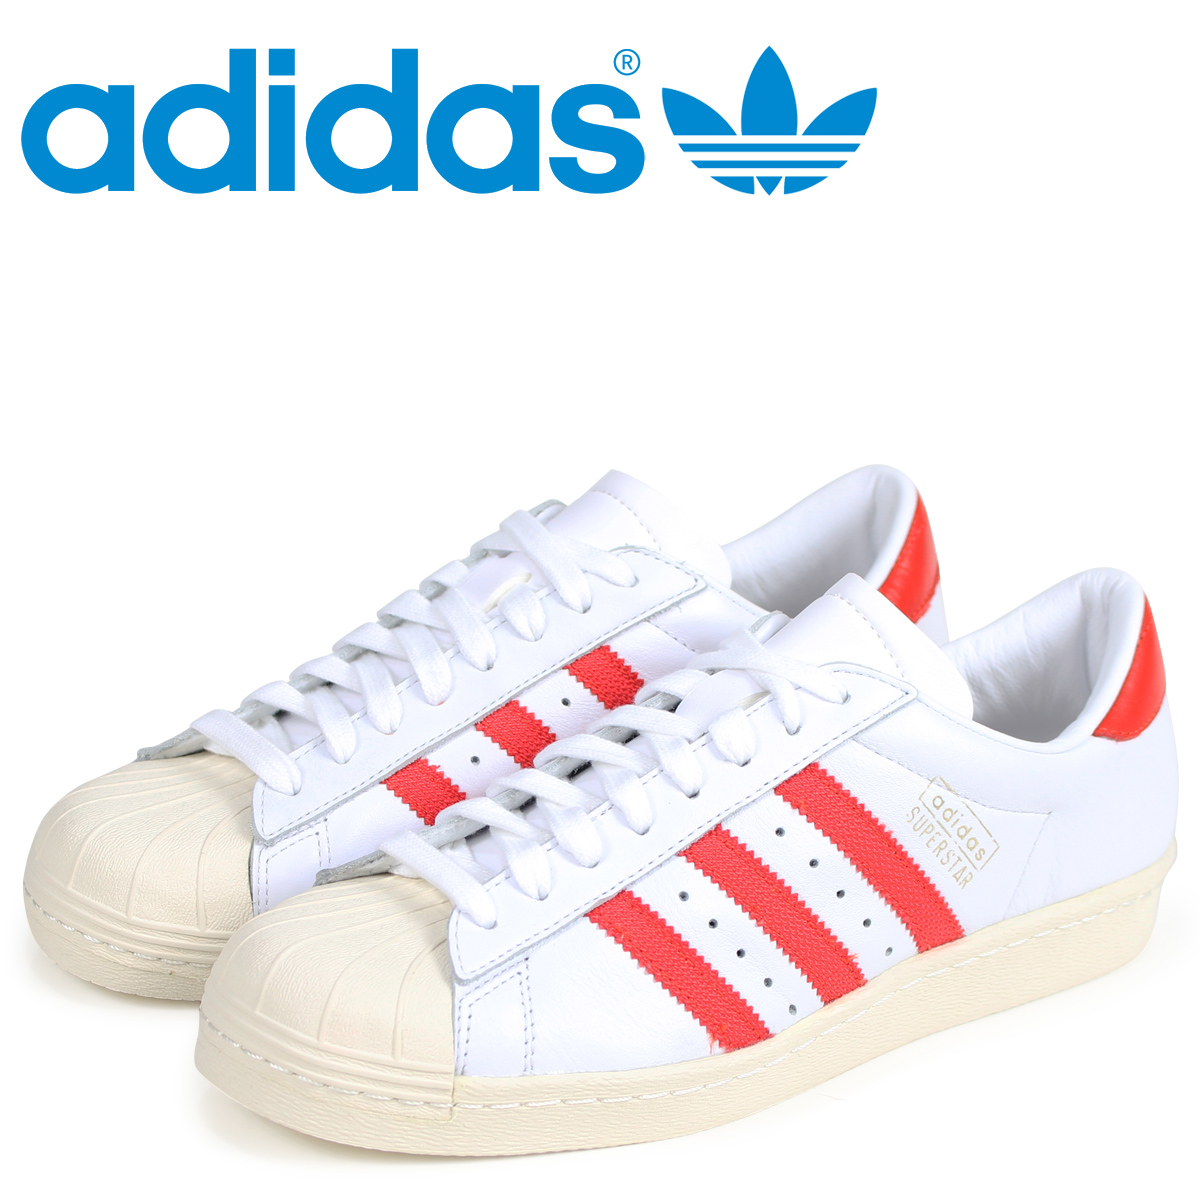 d051ab16d53 Sugar Online Shop  adidas Originals superstar Adidas sneakers ...